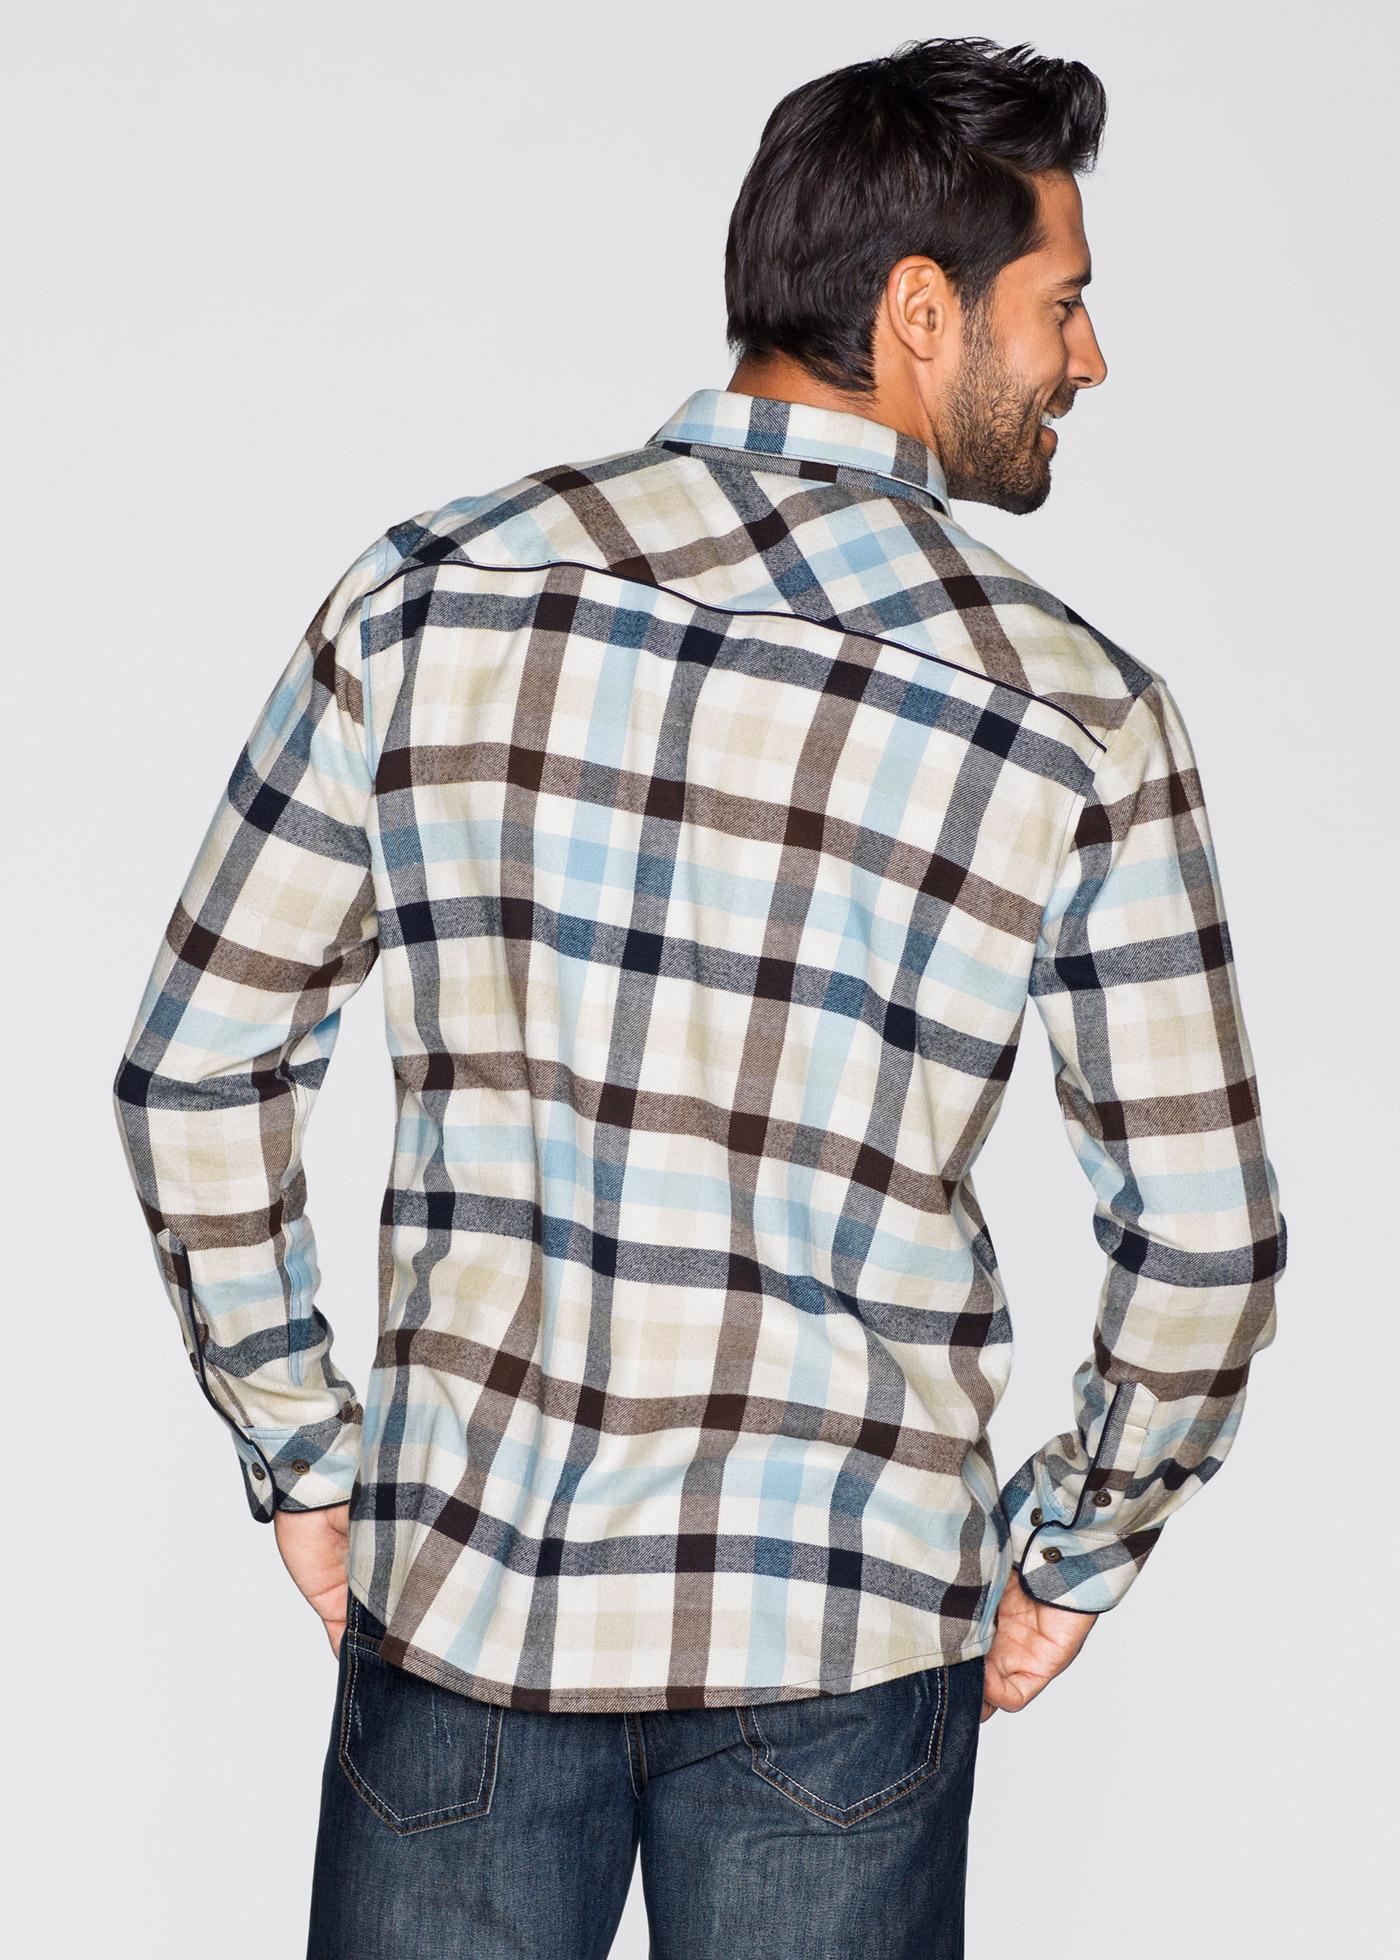 Flanellskjorta Regular Fit, John Baner JEANSWEAR, vit/blå/brun